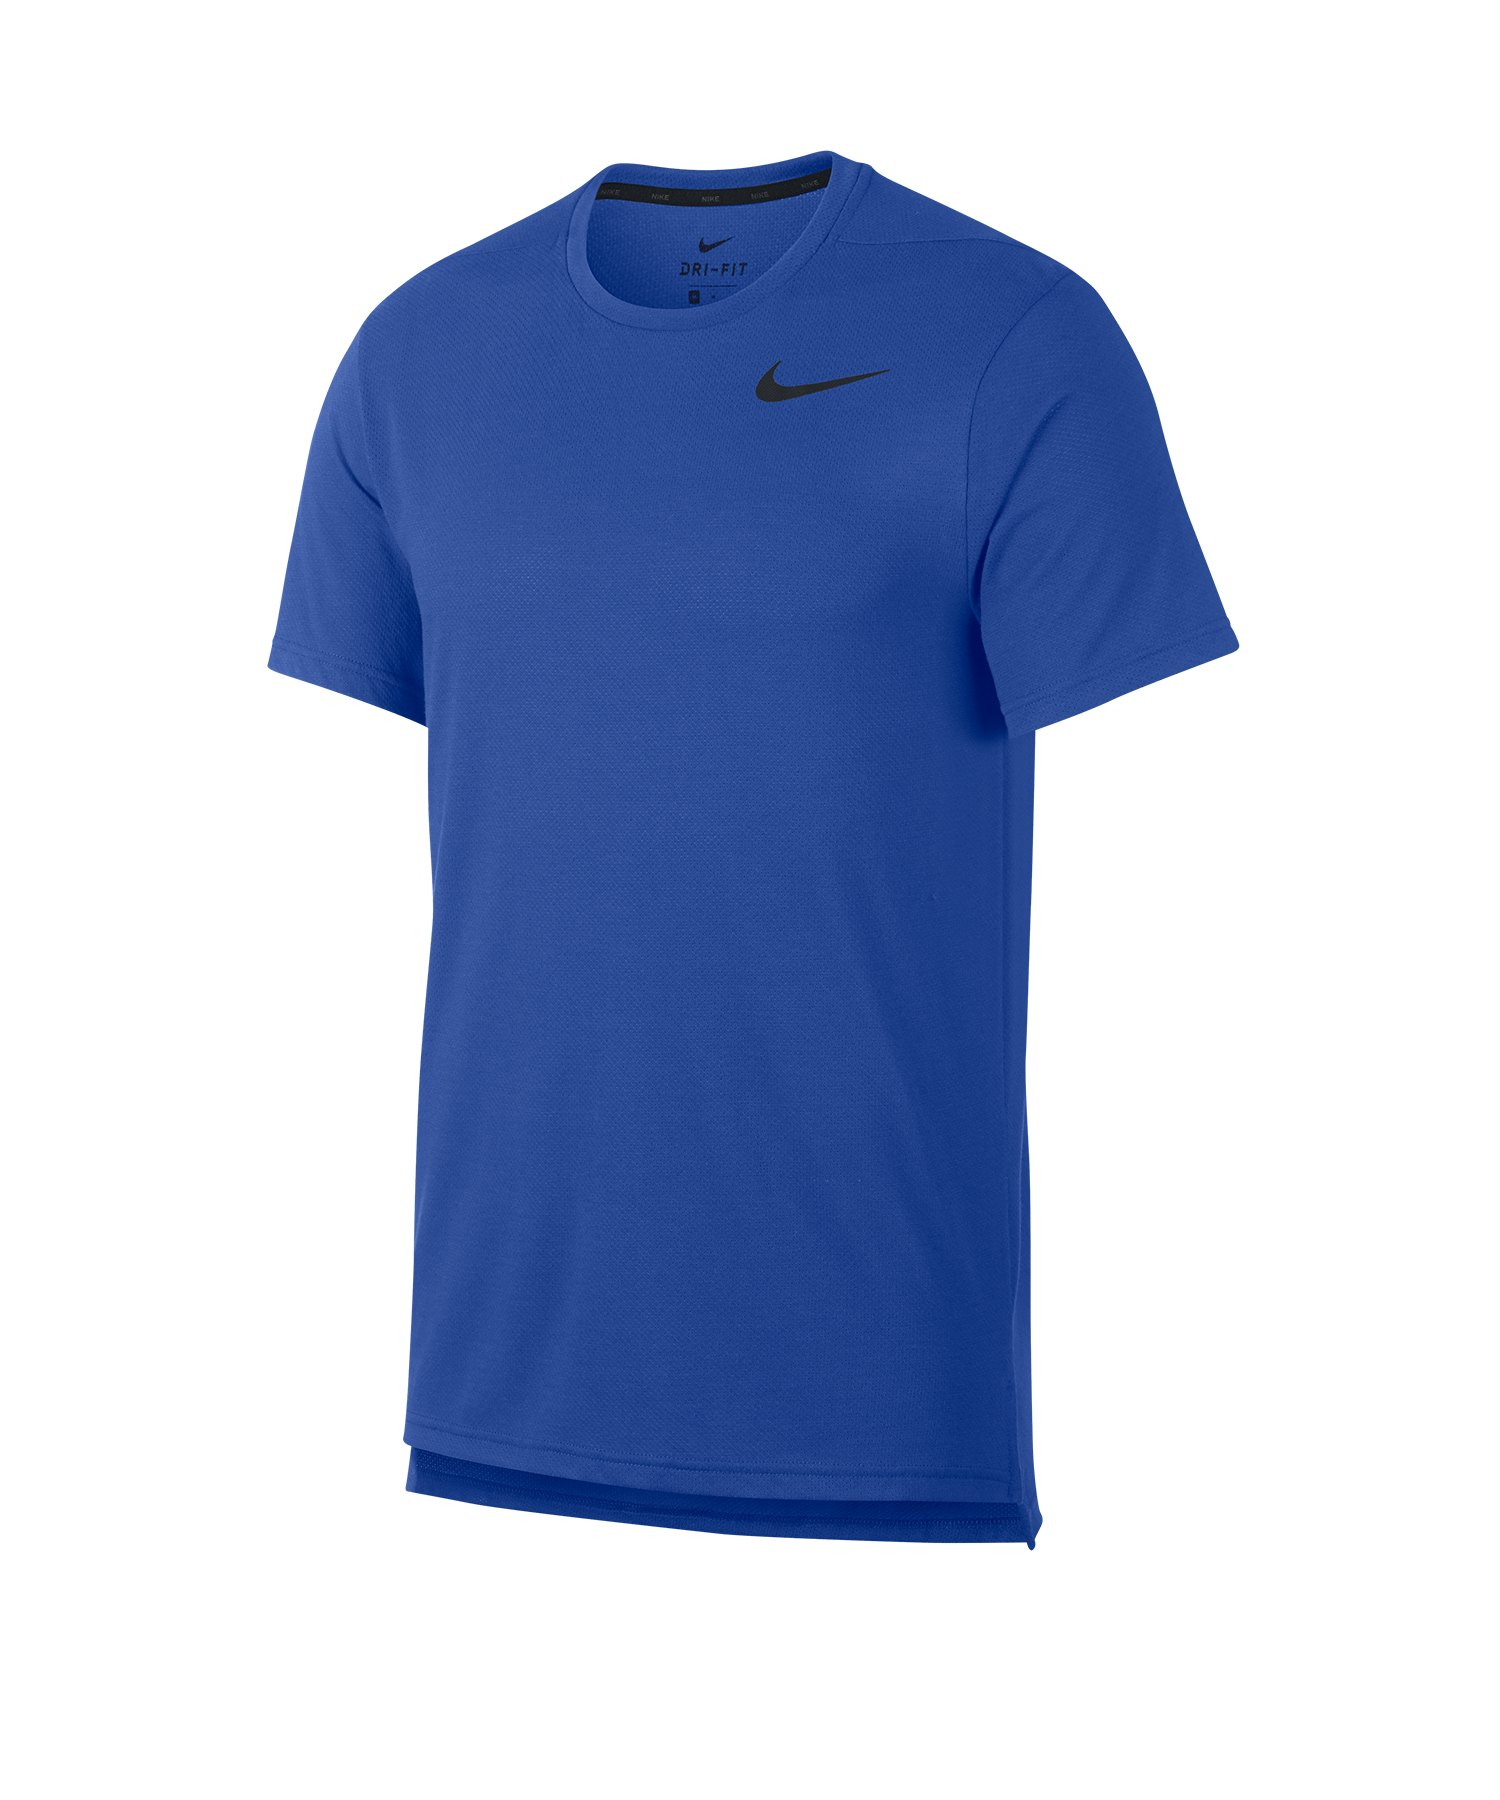 Nike Breathe Dri-FIT T-Shirt Blau F480 - blau